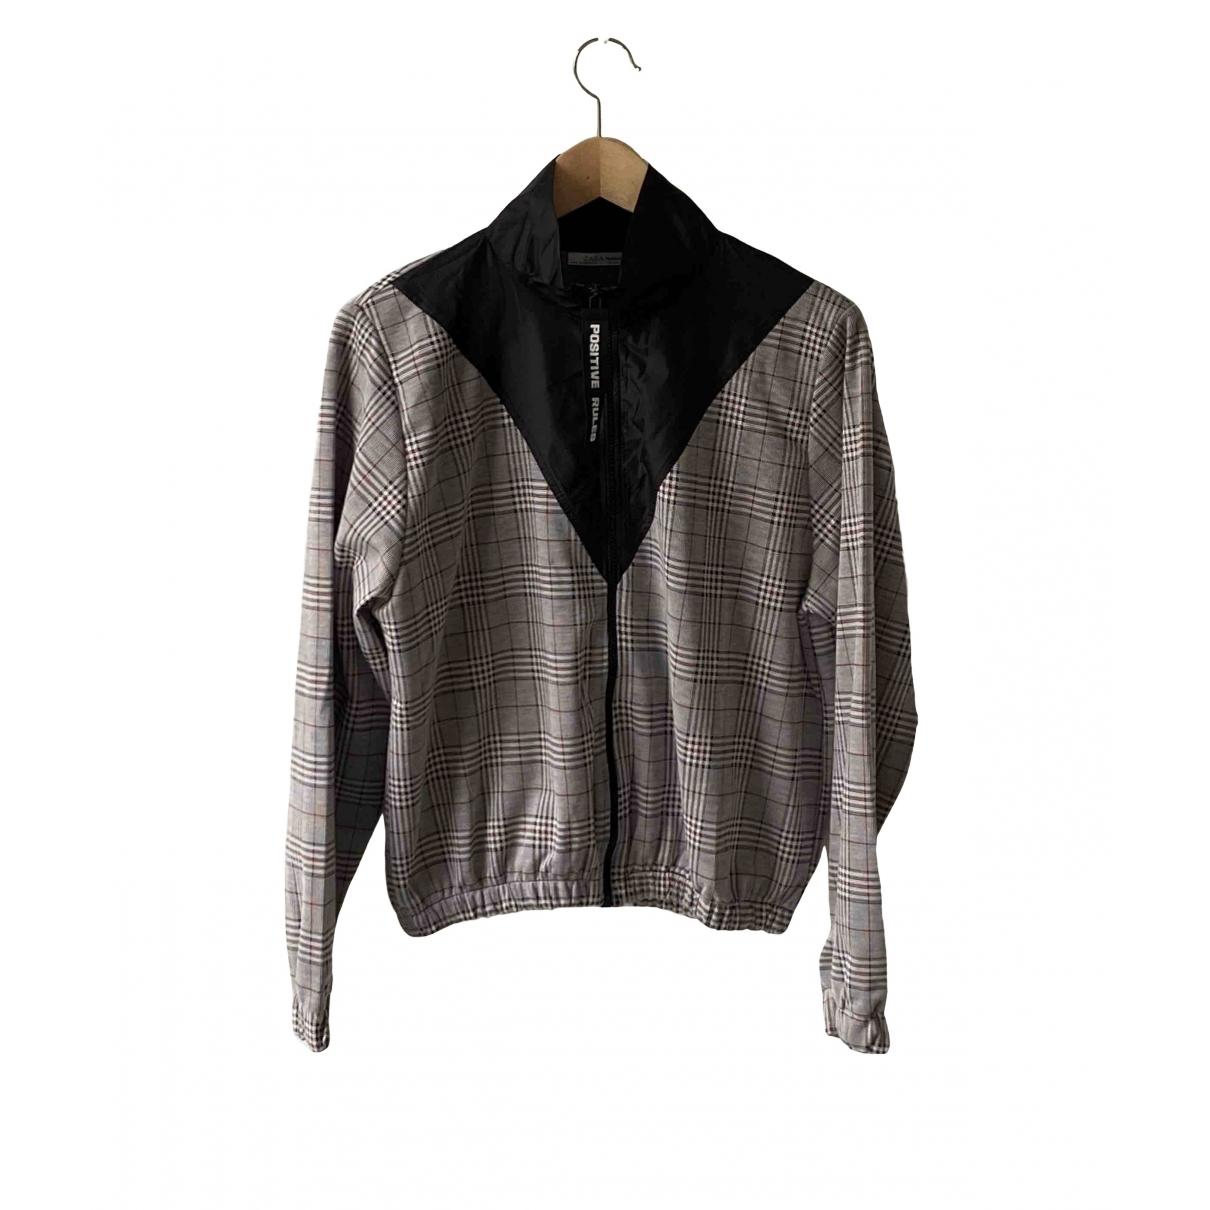 Zara \N Grey jacket for Women M International